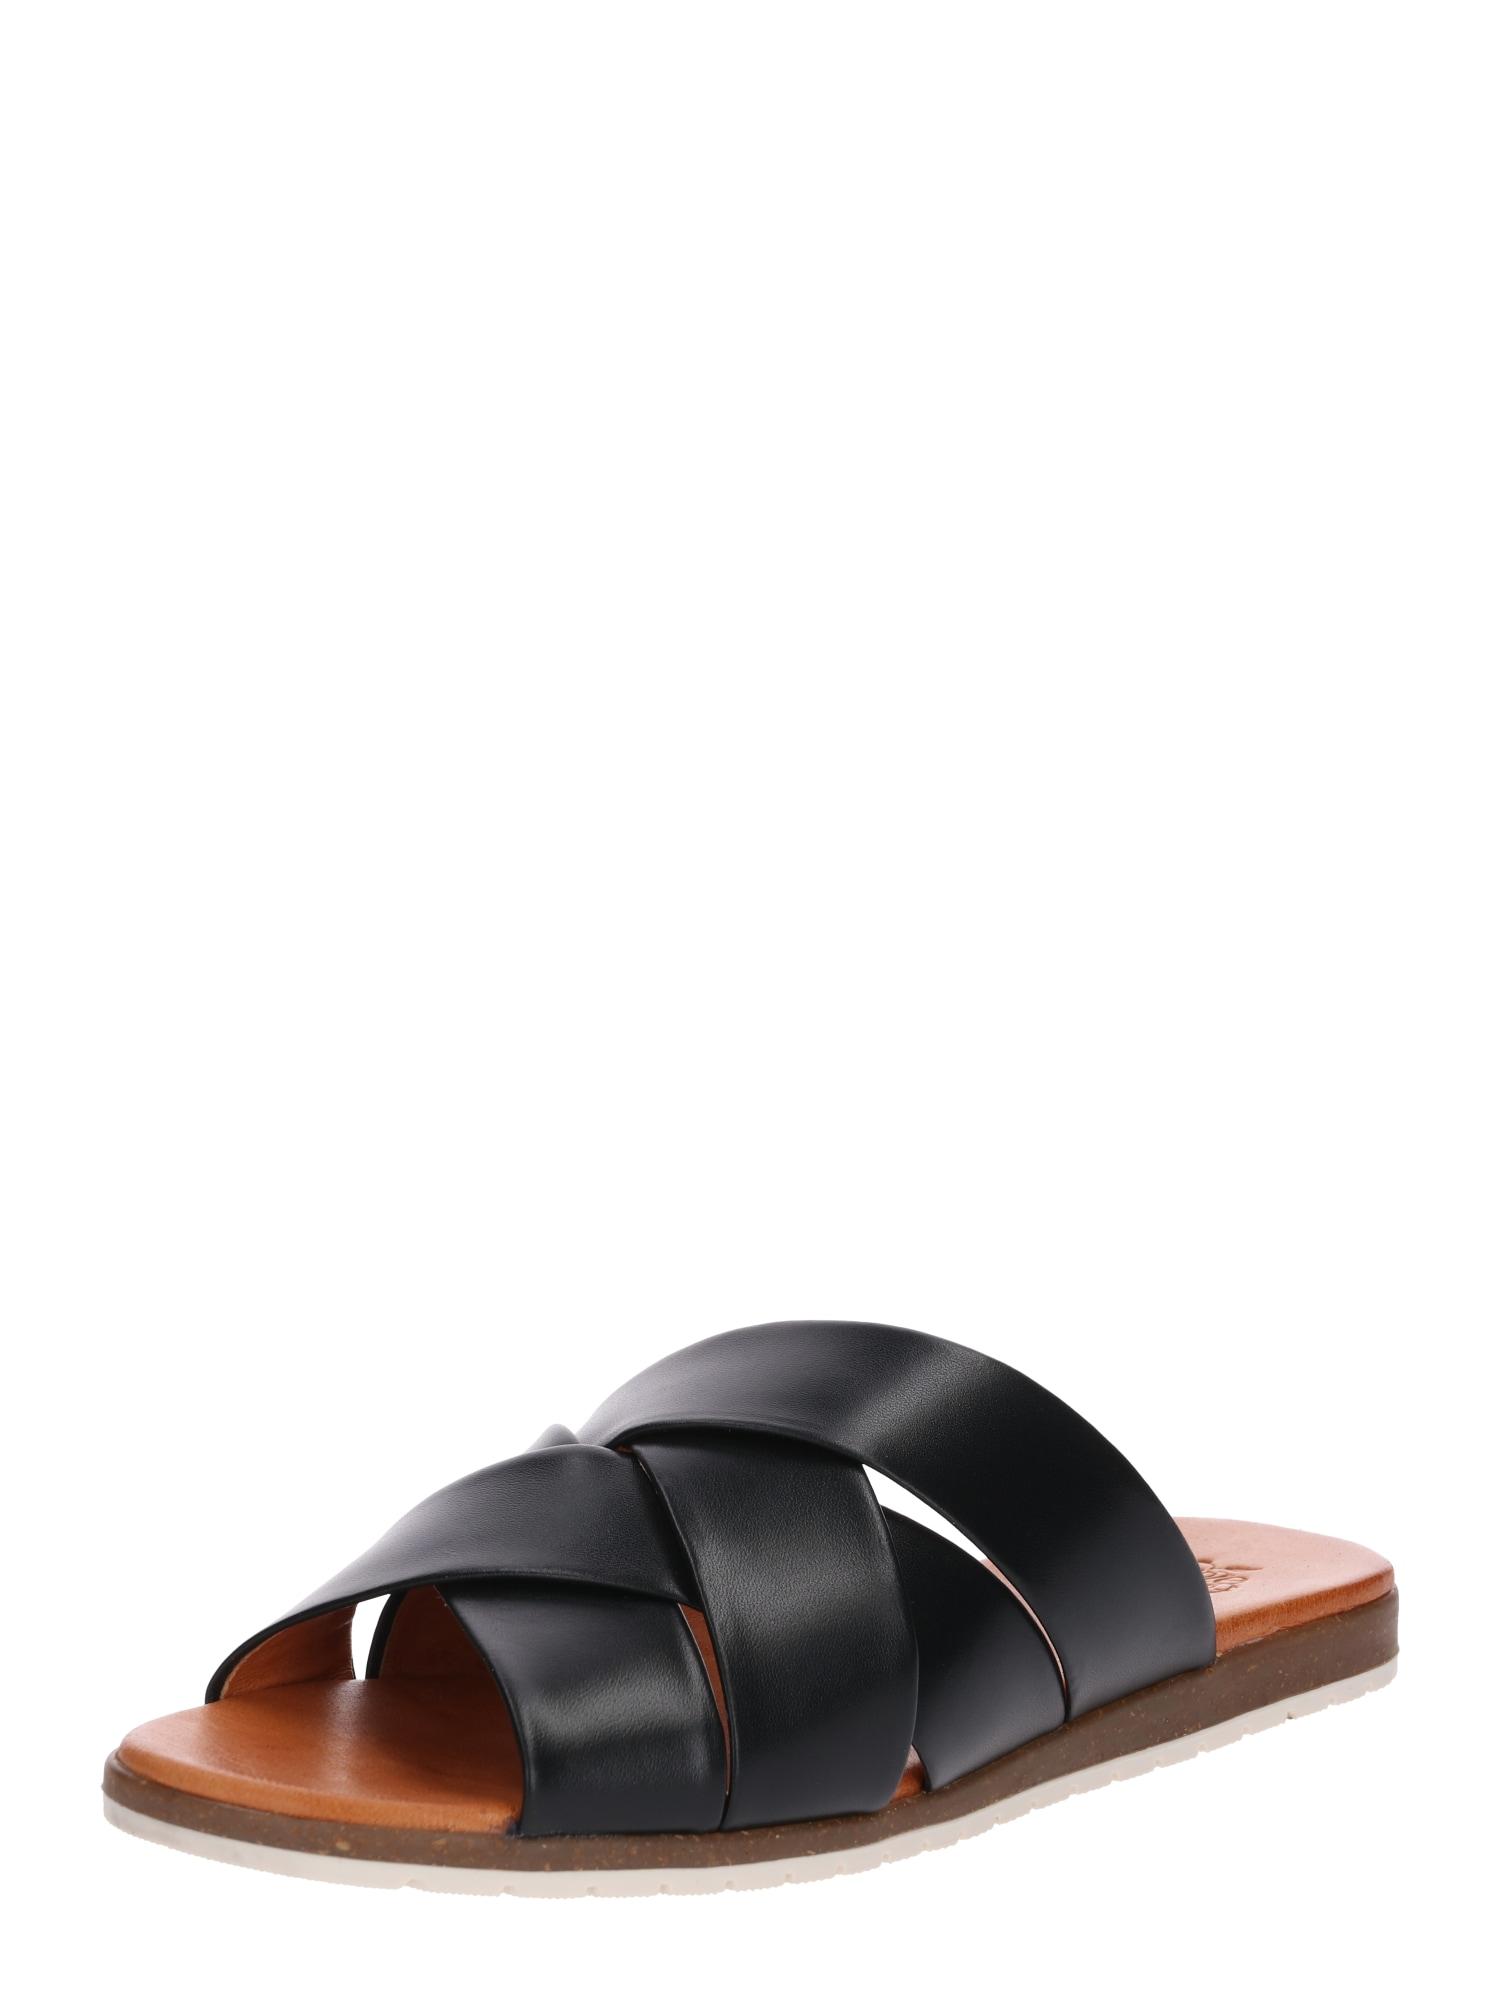 Pantofle Berta béžová černá Apple Of Eden